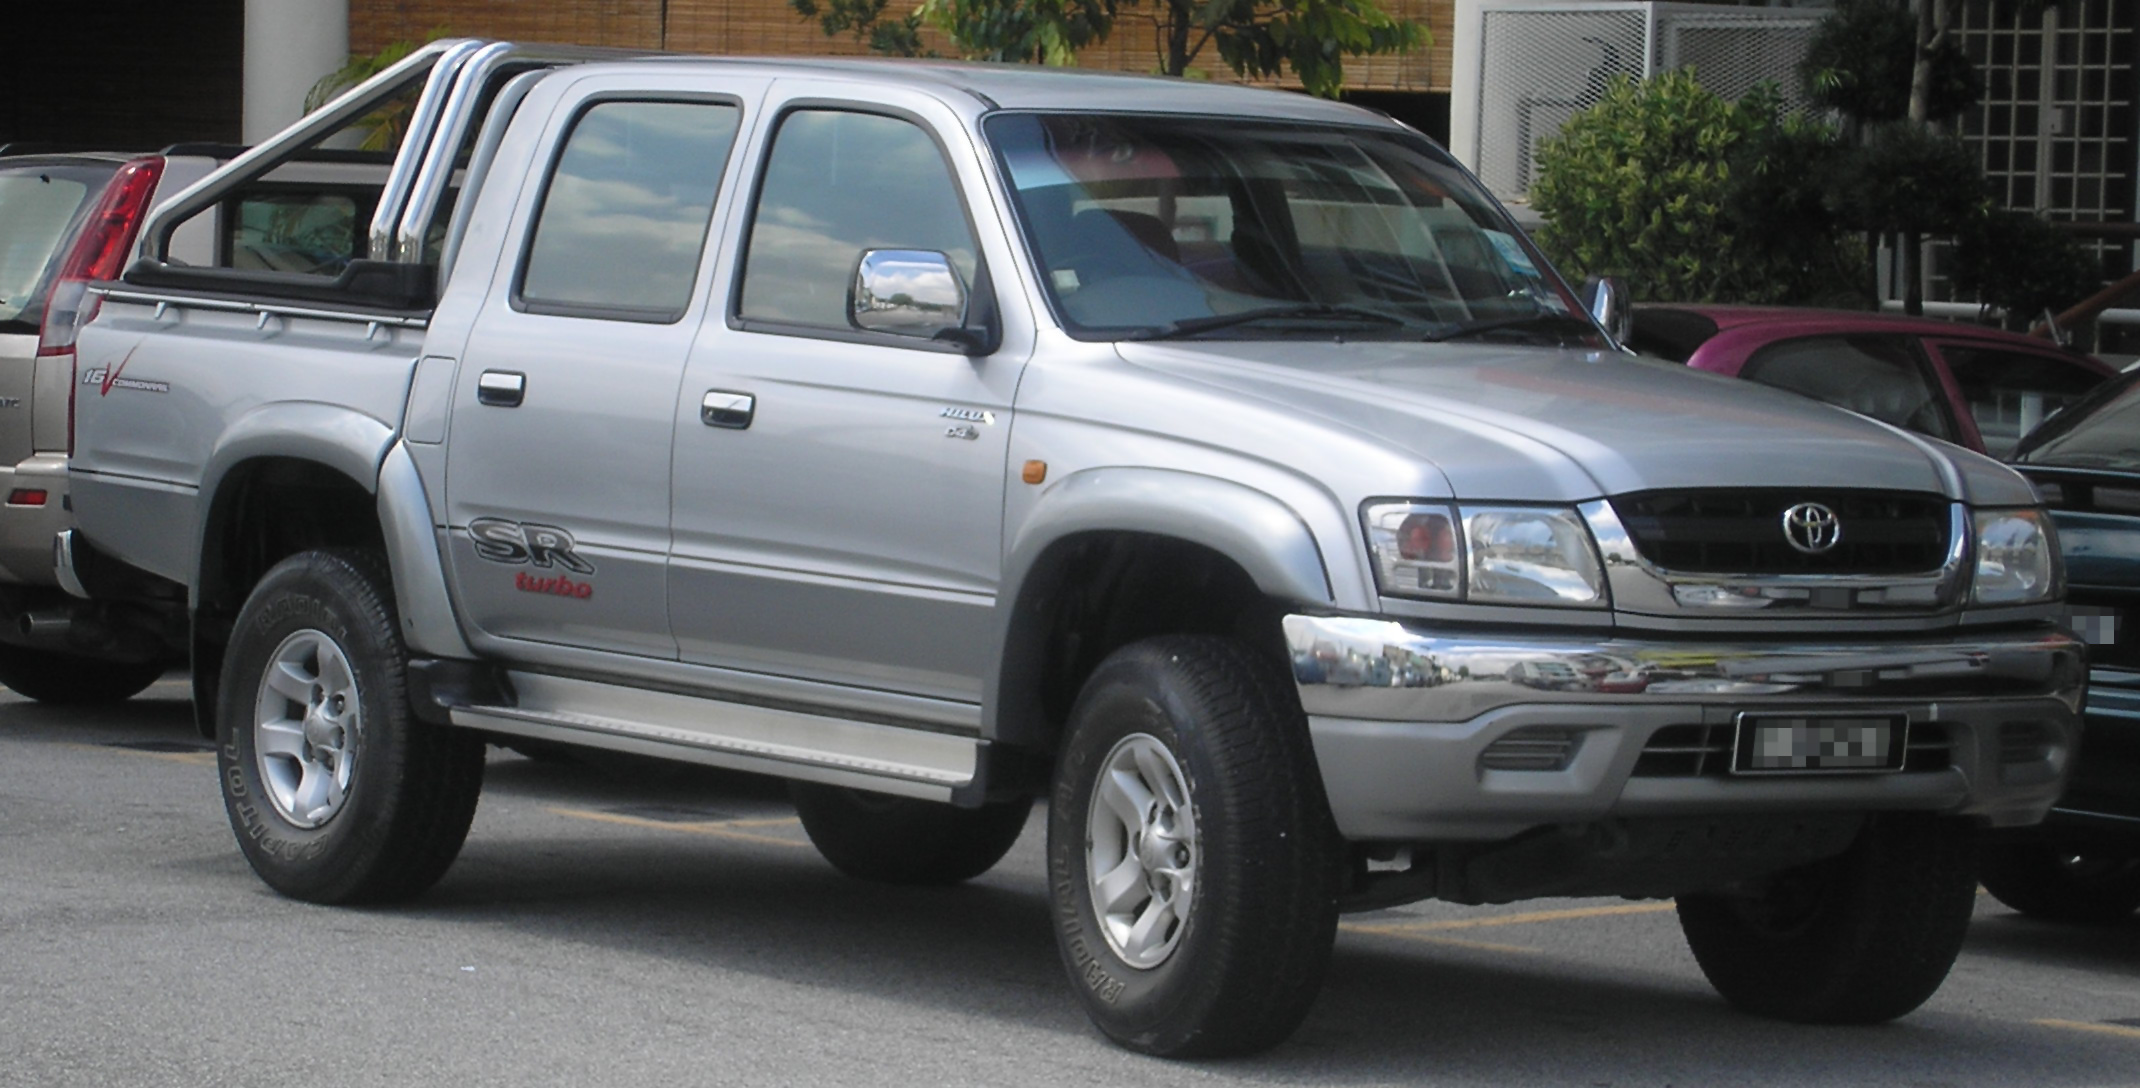 Camioneta Toyota Pick Up Idea De Imagen Del Coche Toyotas Hilux Usados En Guatemala Wikiwand Download Image 2140 X 1088